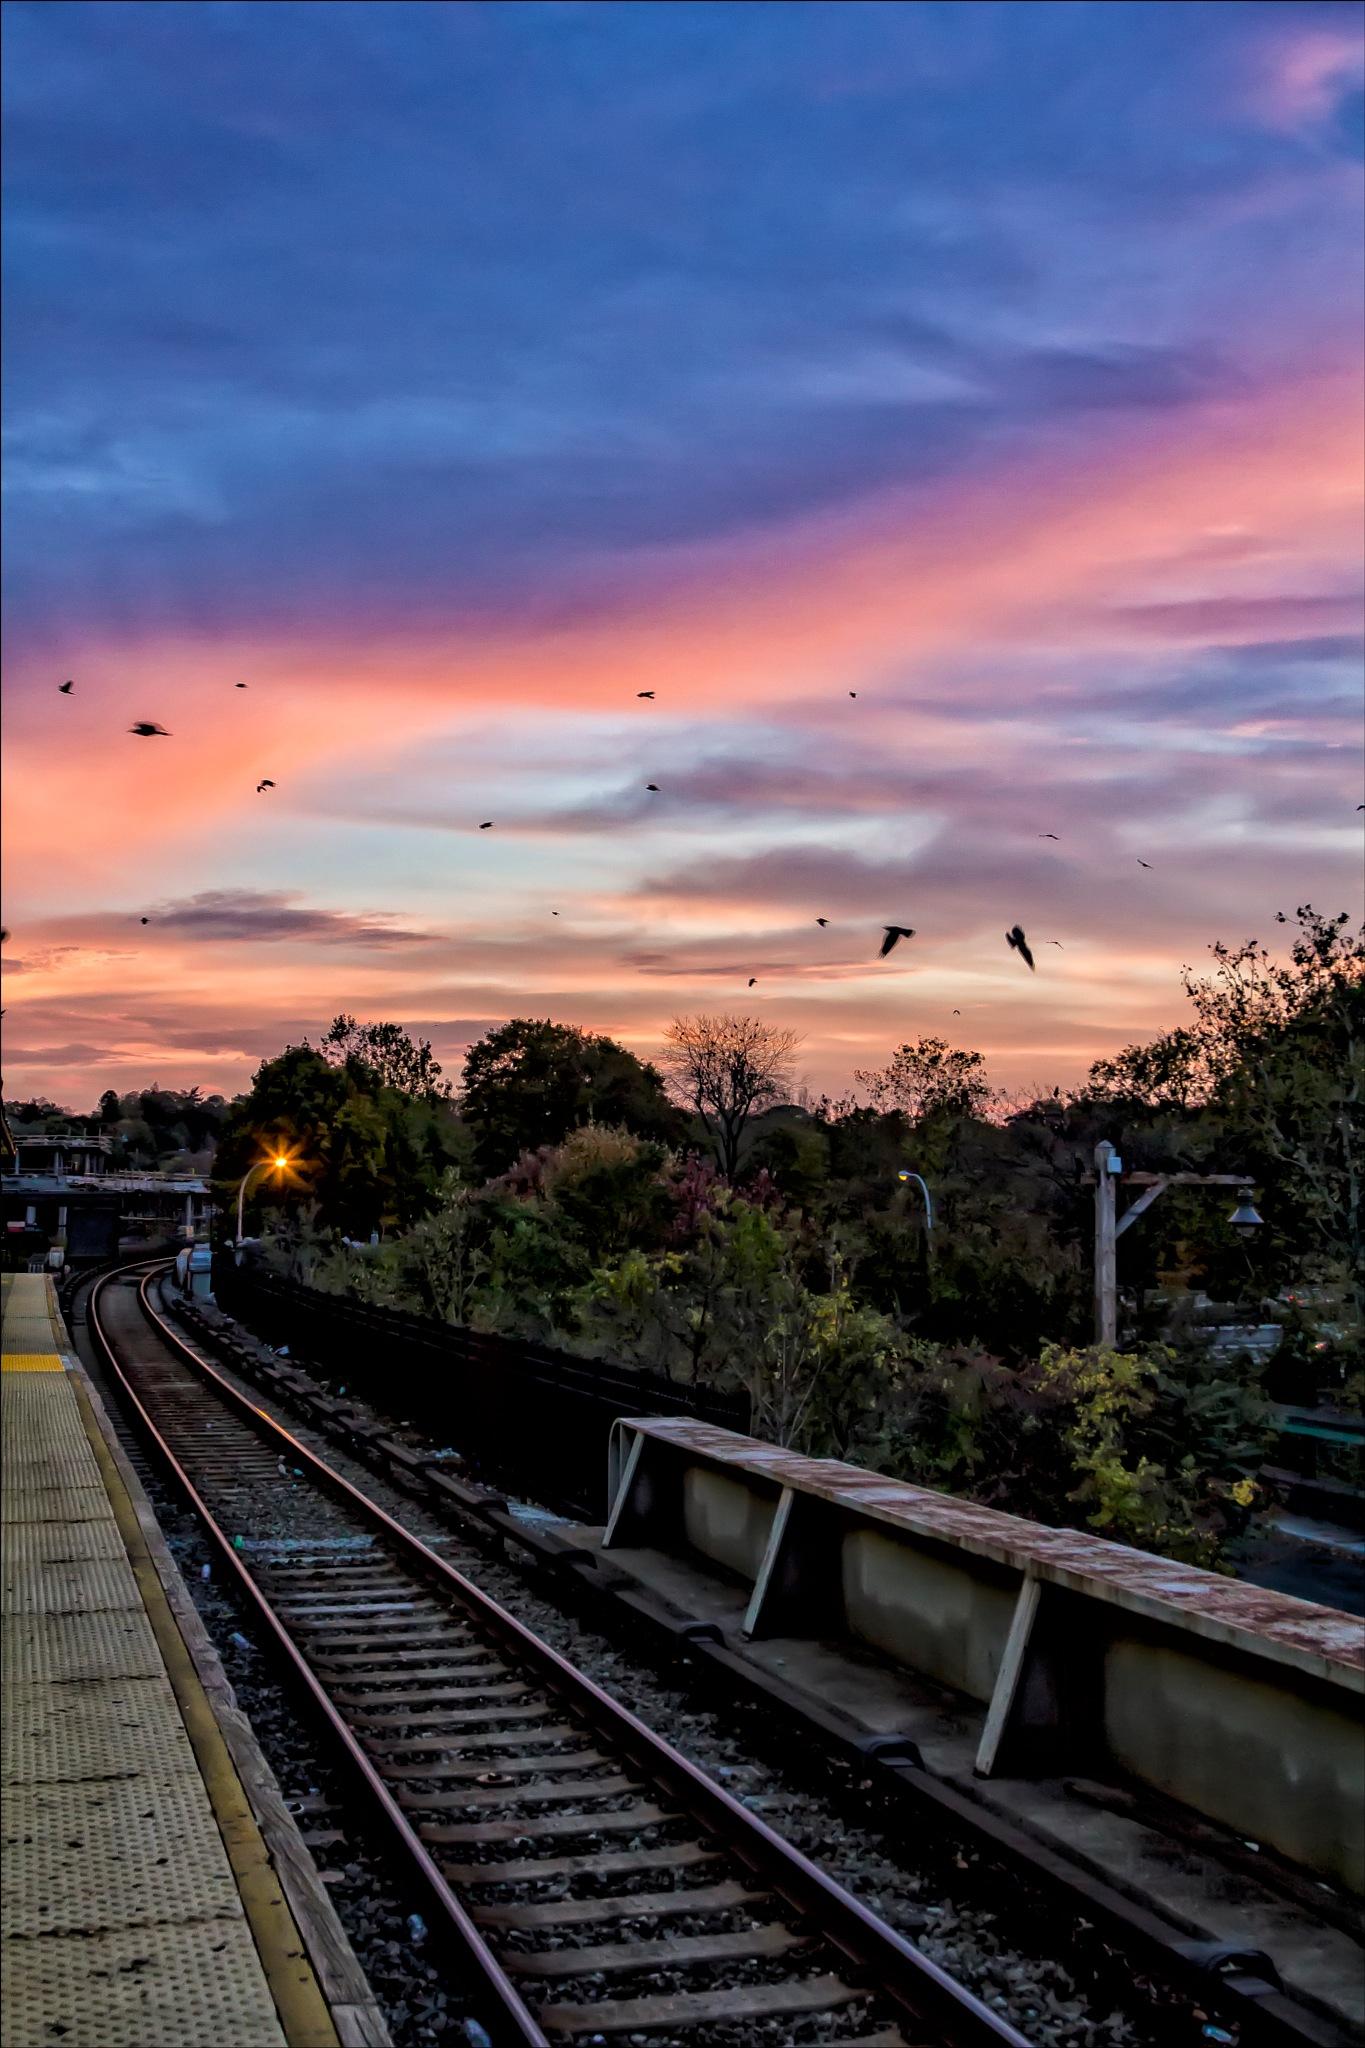 Train Tracks Sunset and Birds by robertullmann